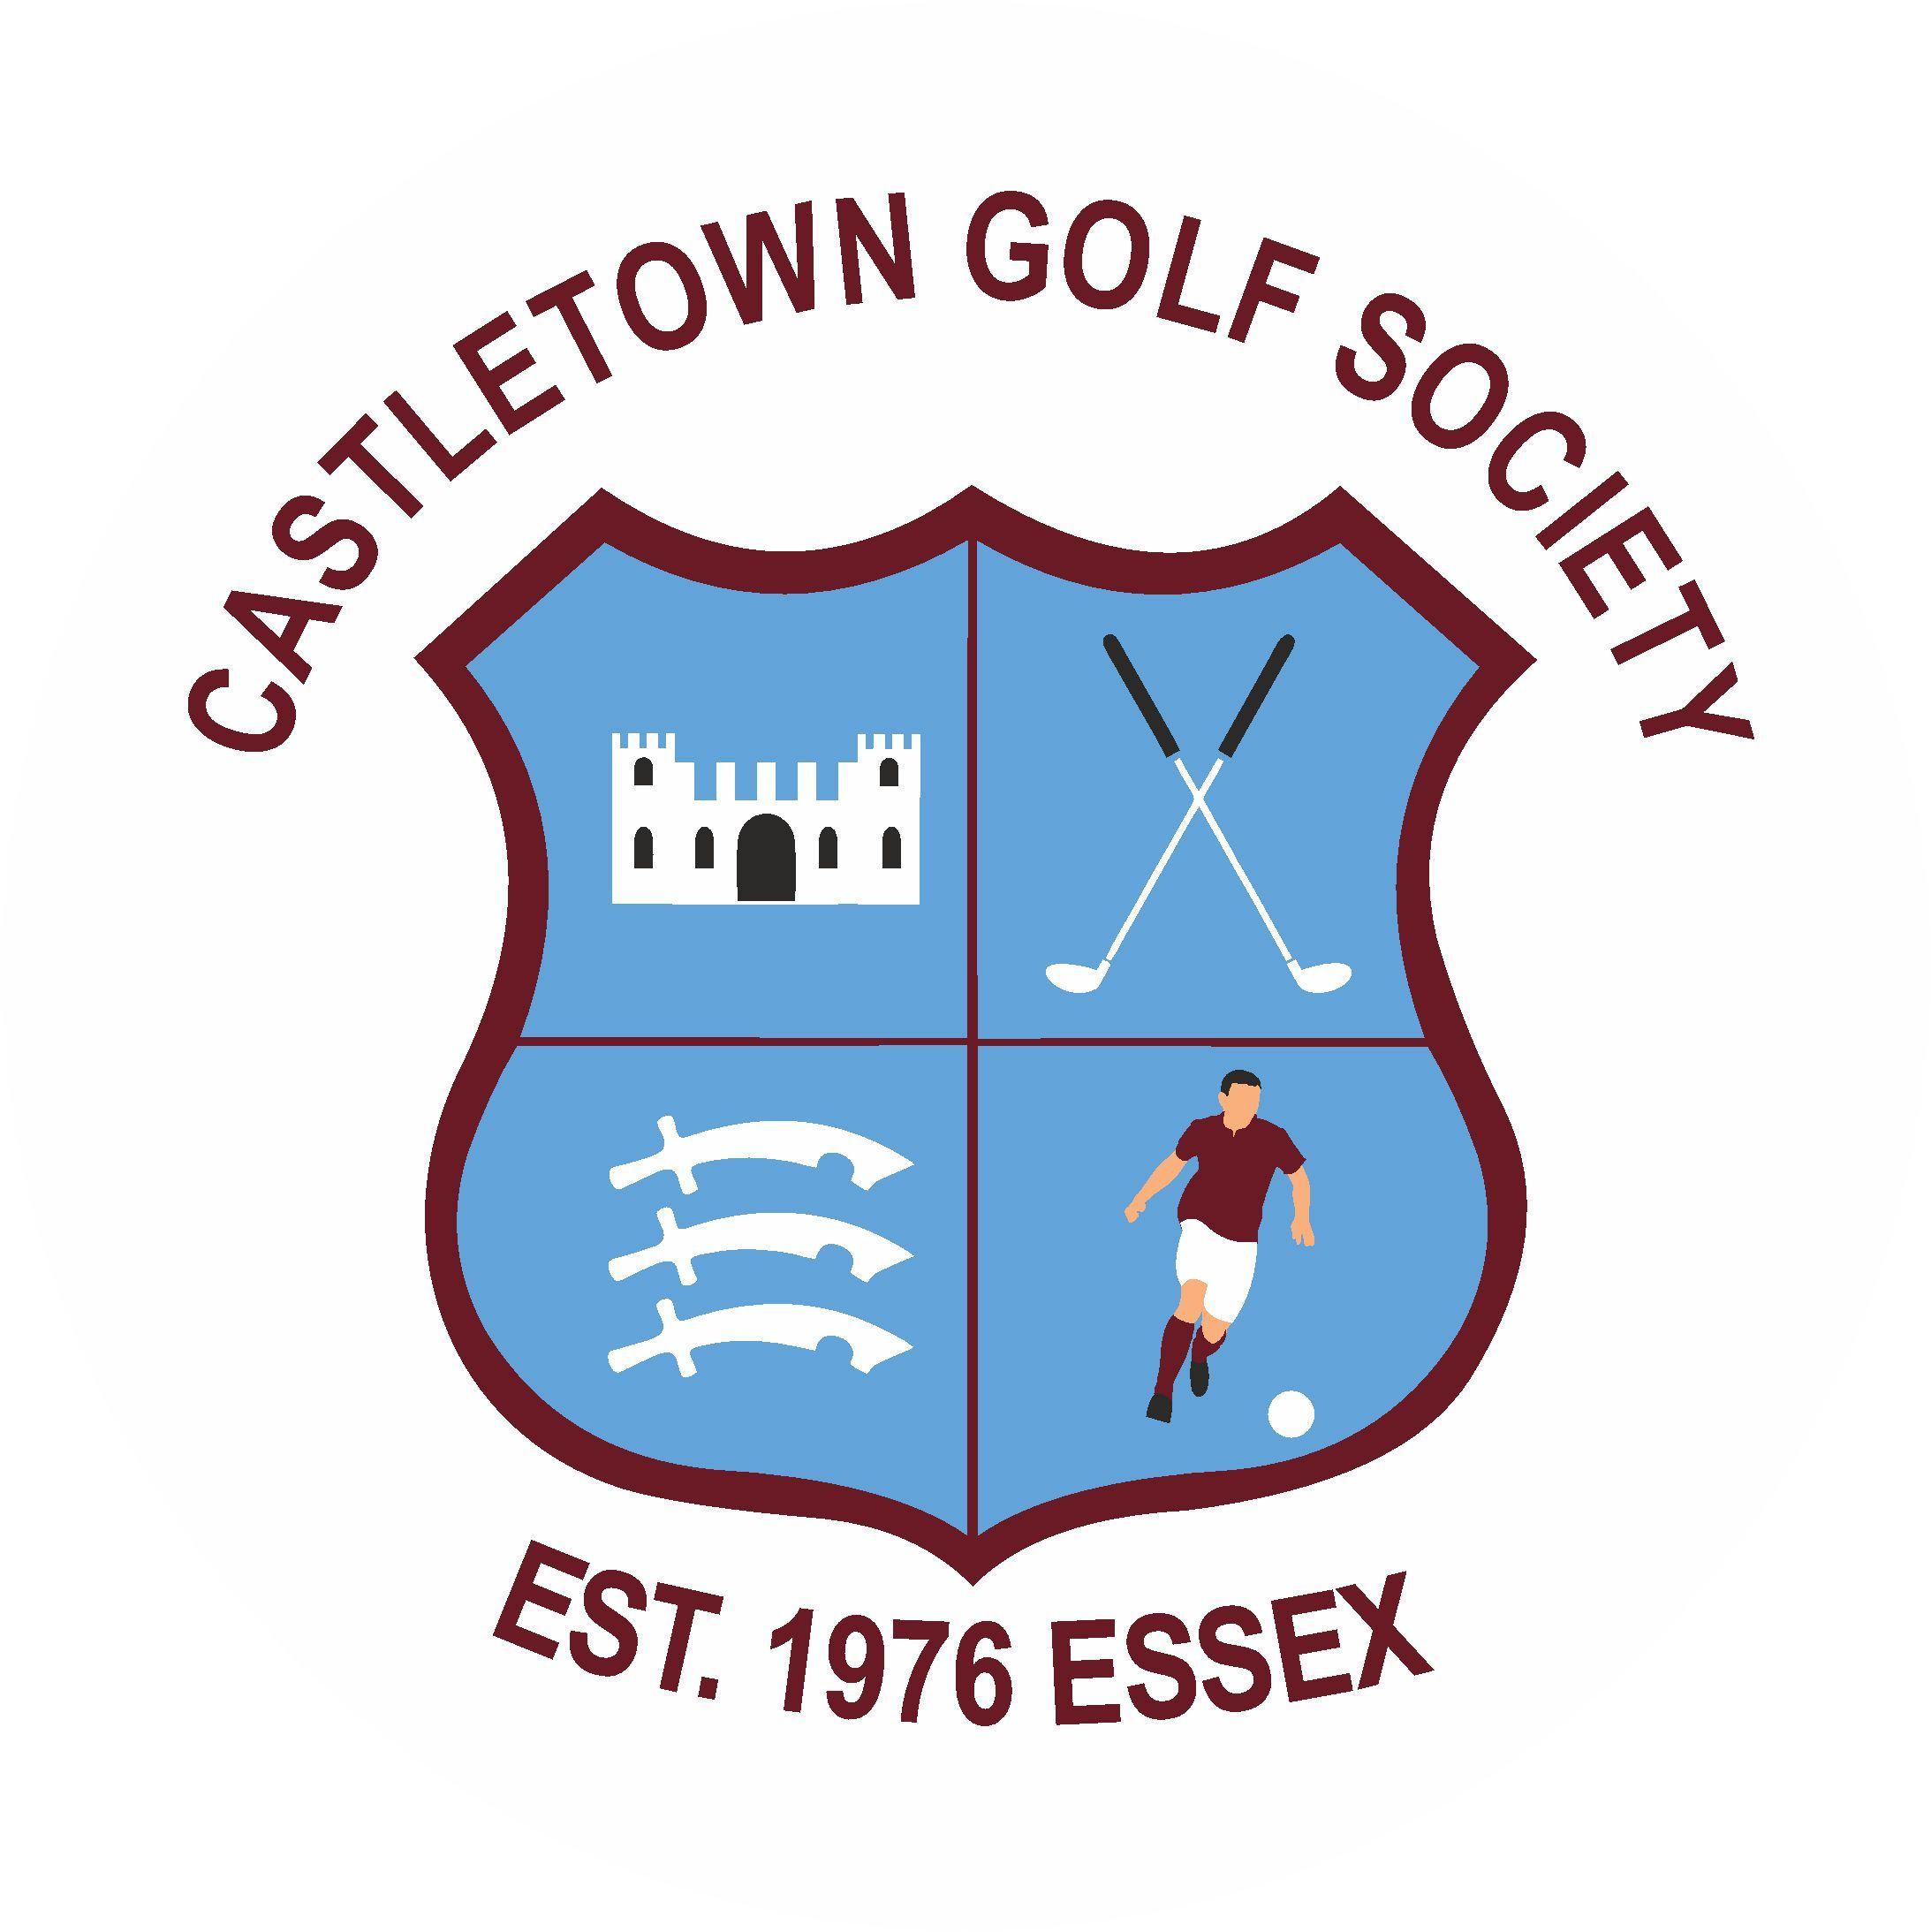 Ray Gunn- Castletown Golf Society